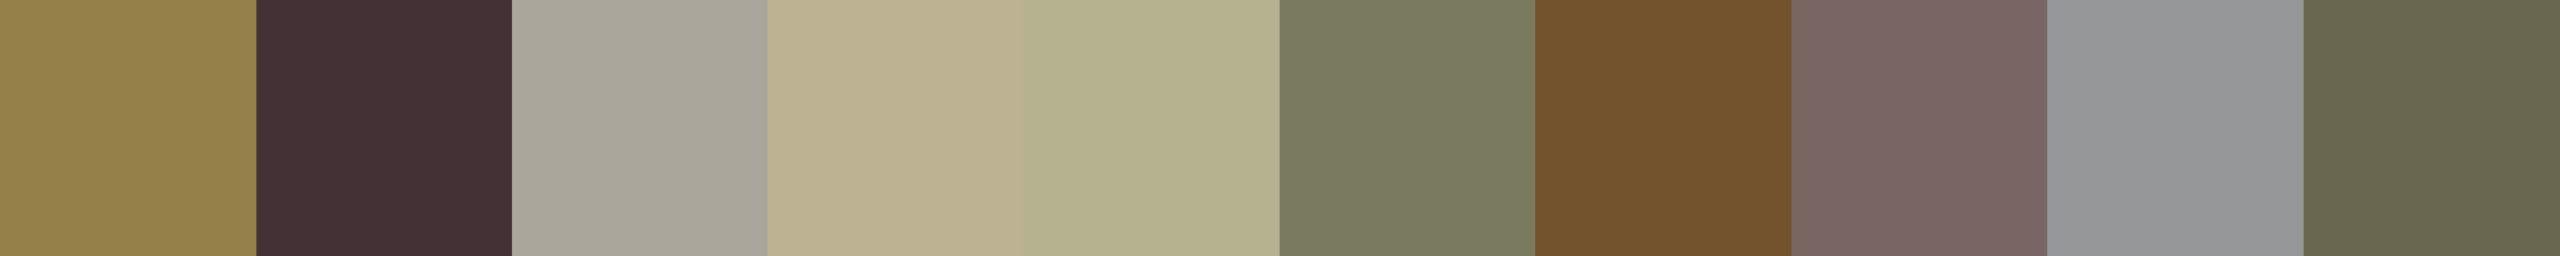 630 Frograda Color Palette